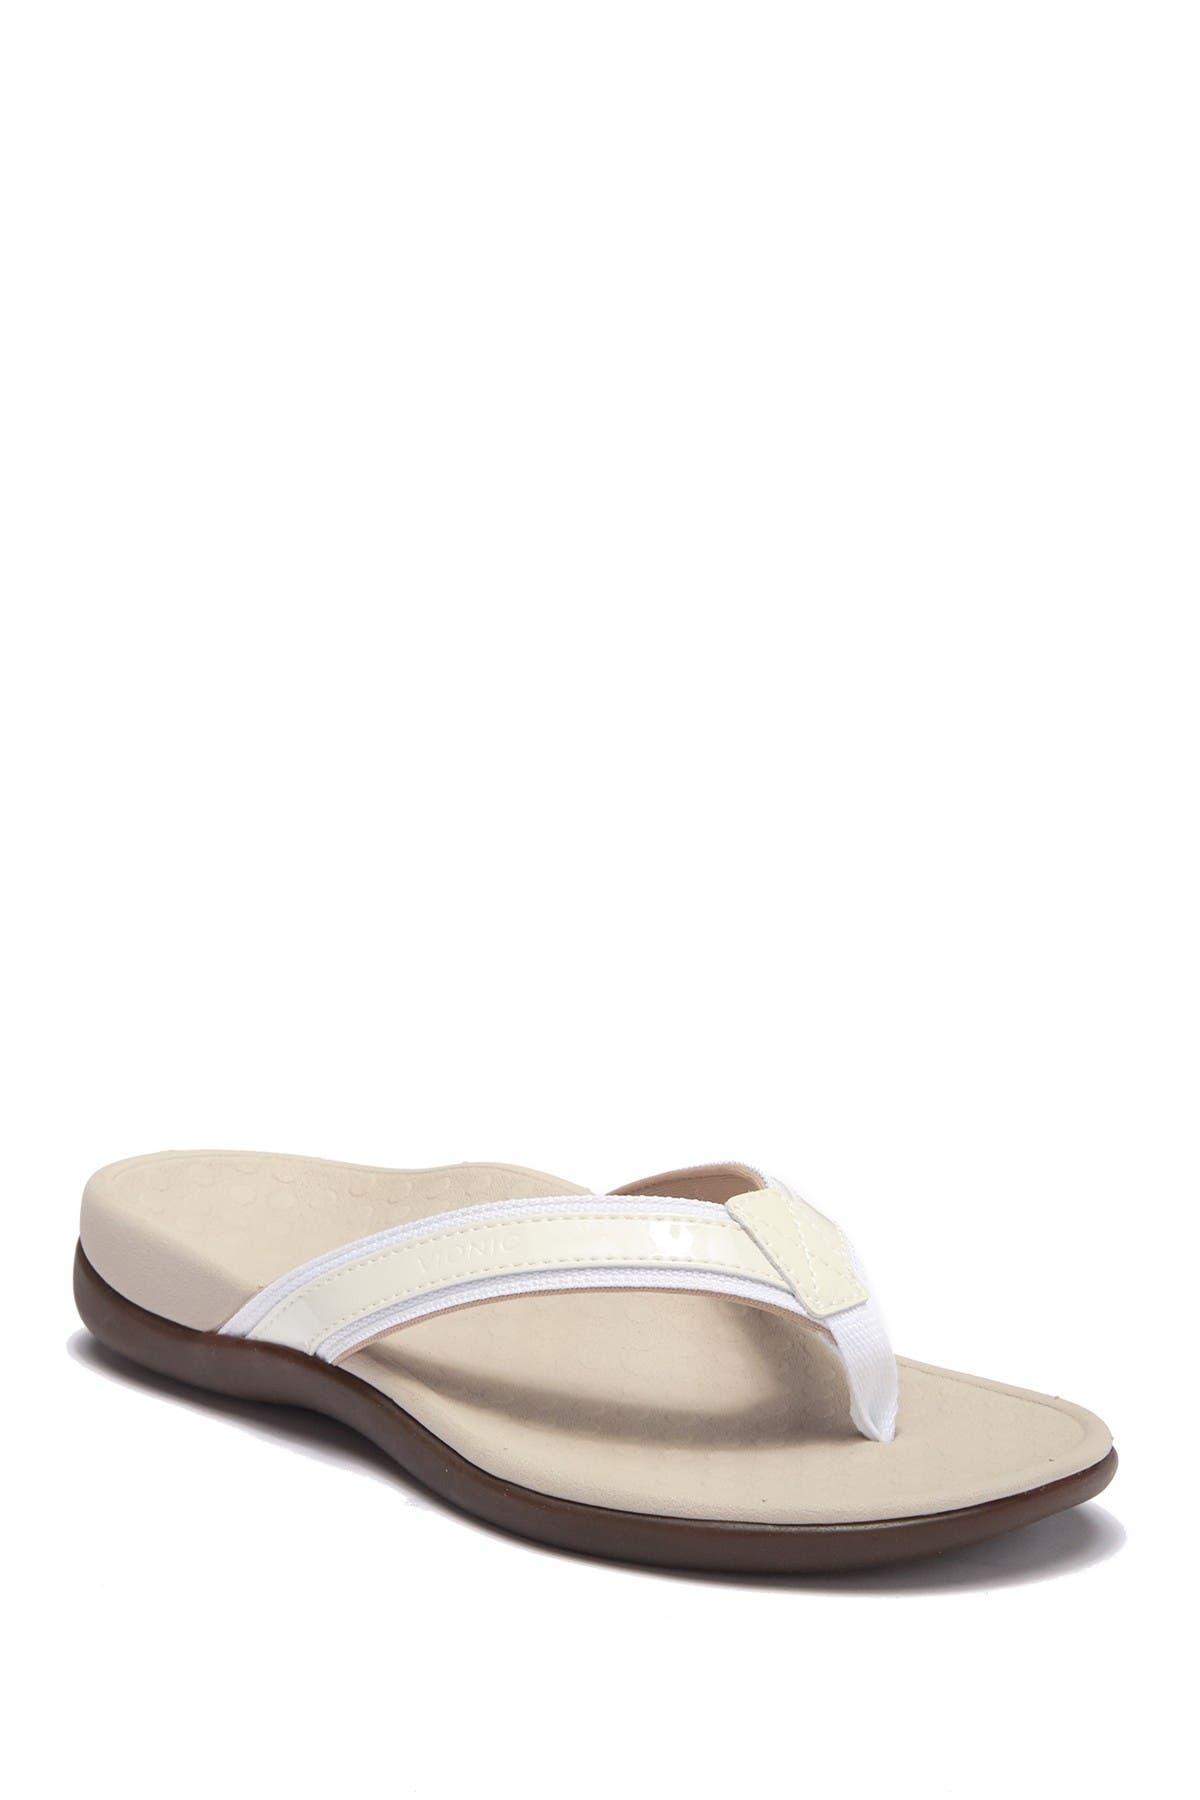 Vionic | Tide II Sandal | Nordstrom Rack